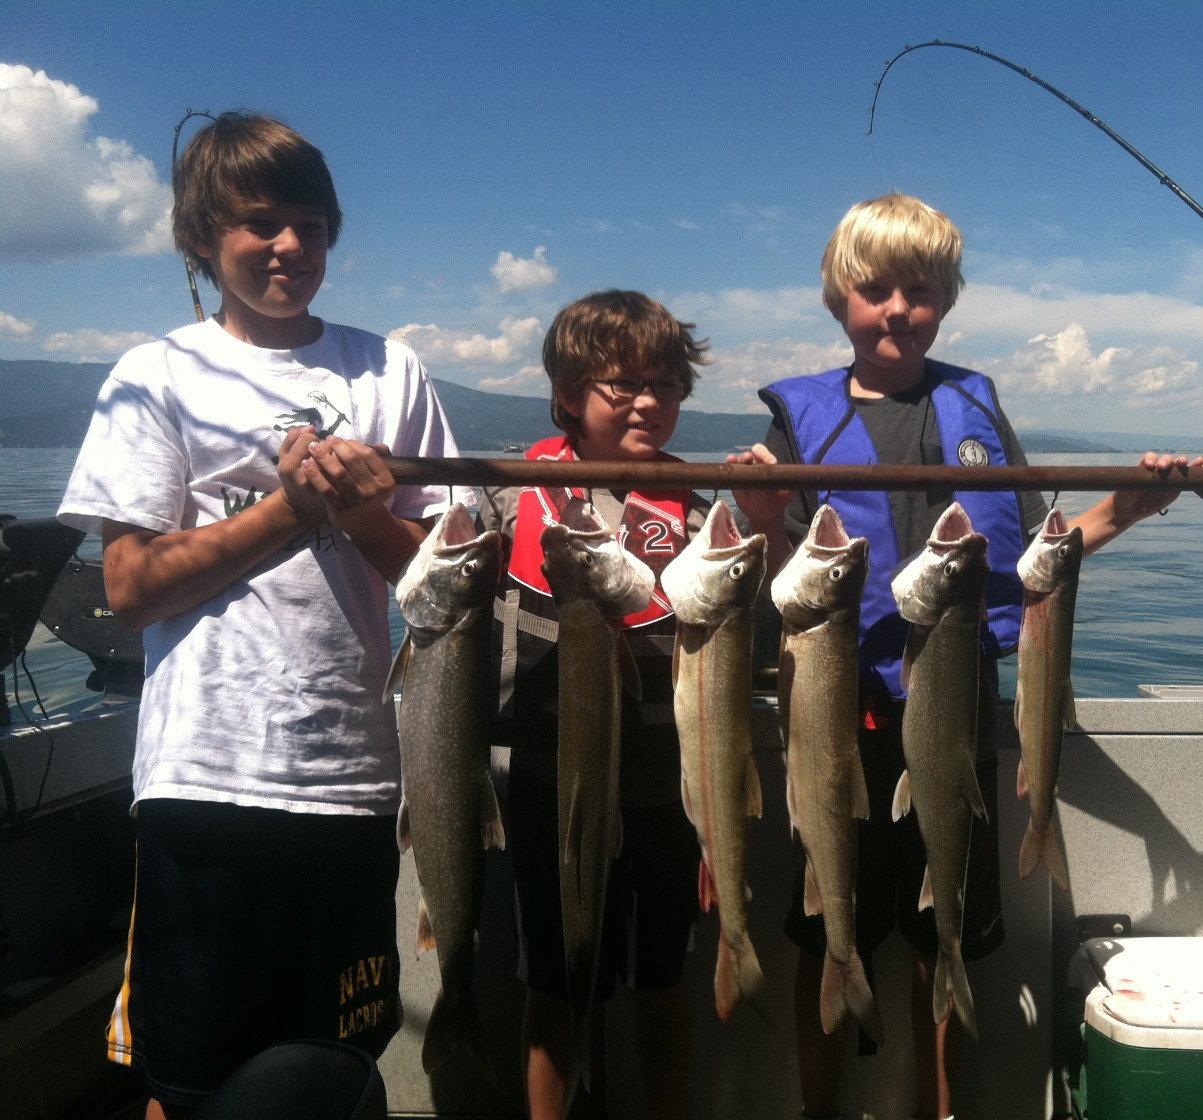 HALF DAY FISHING TRIP